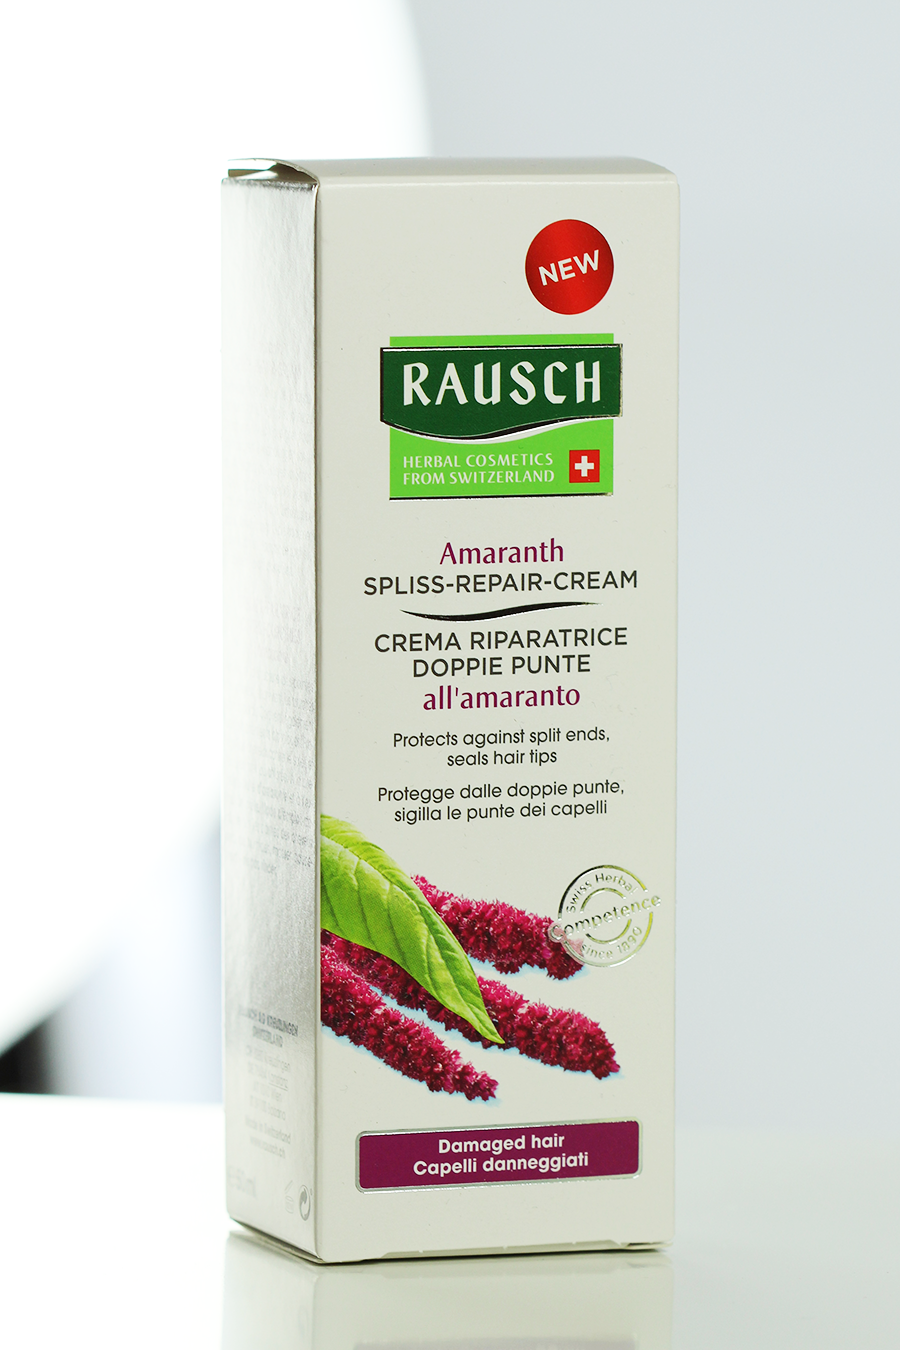 Rausch-Shampoo-Review